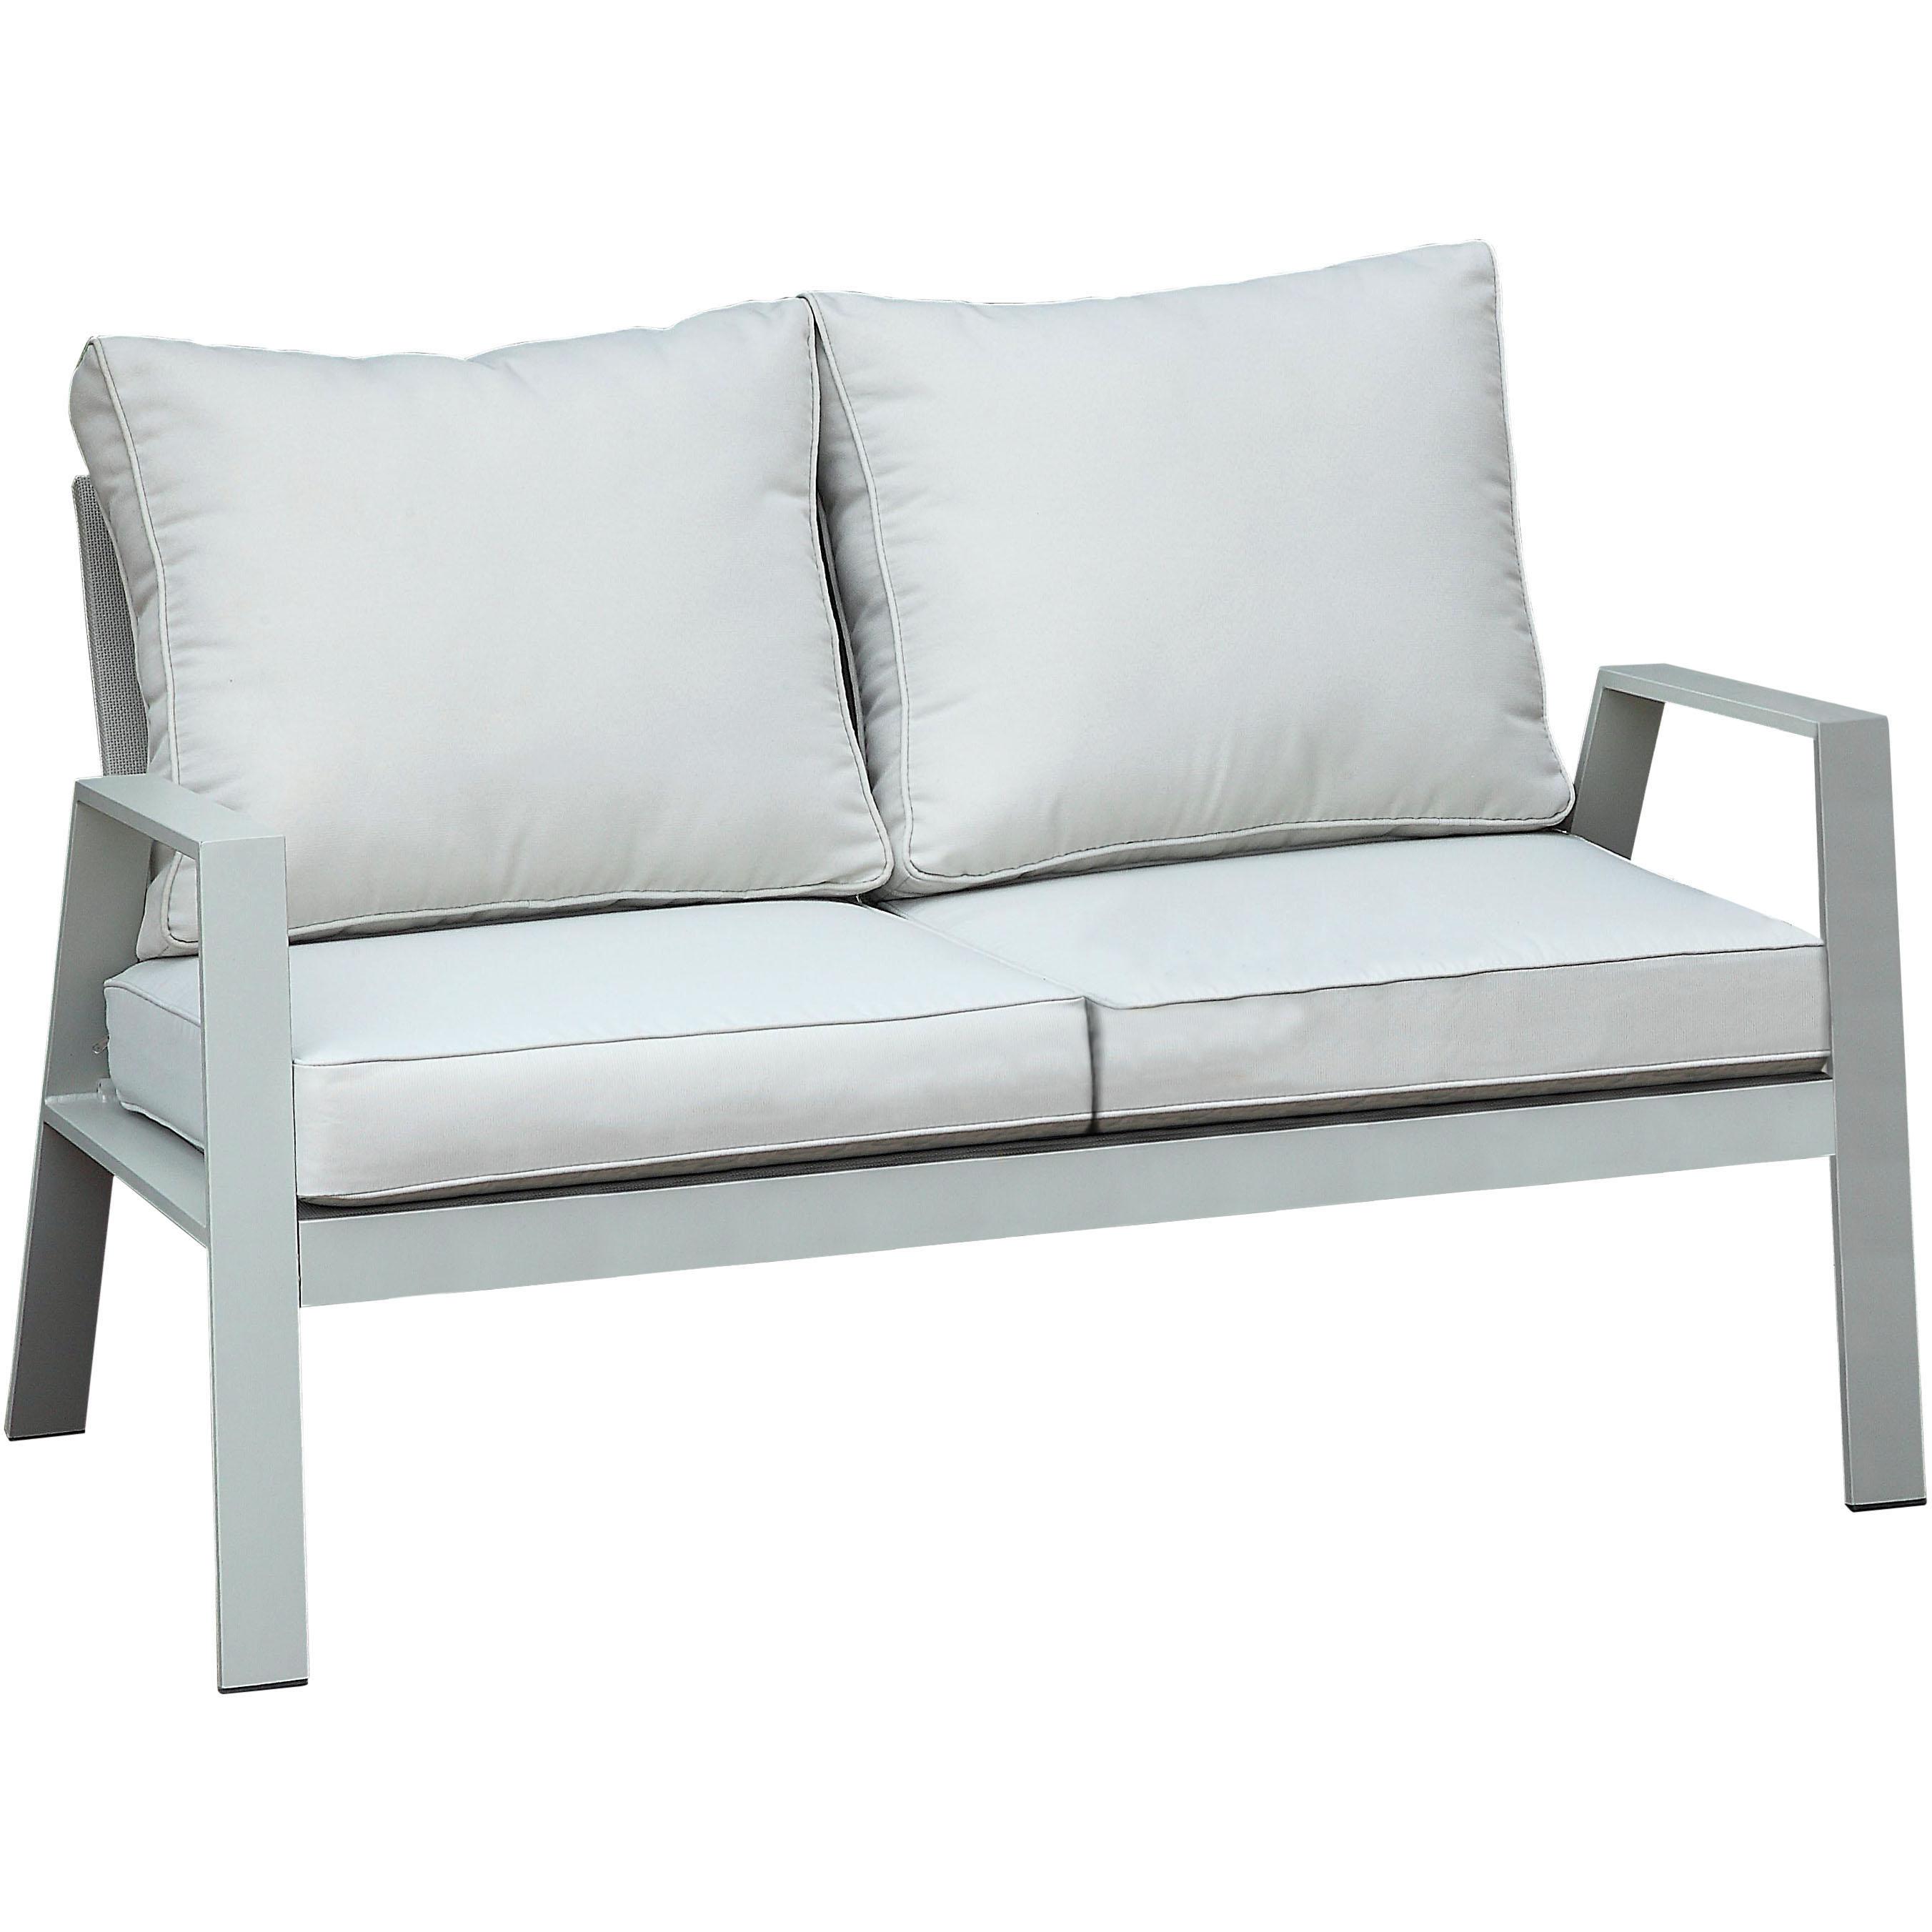 Furniture of America Colton Patio Loveseat, Gray